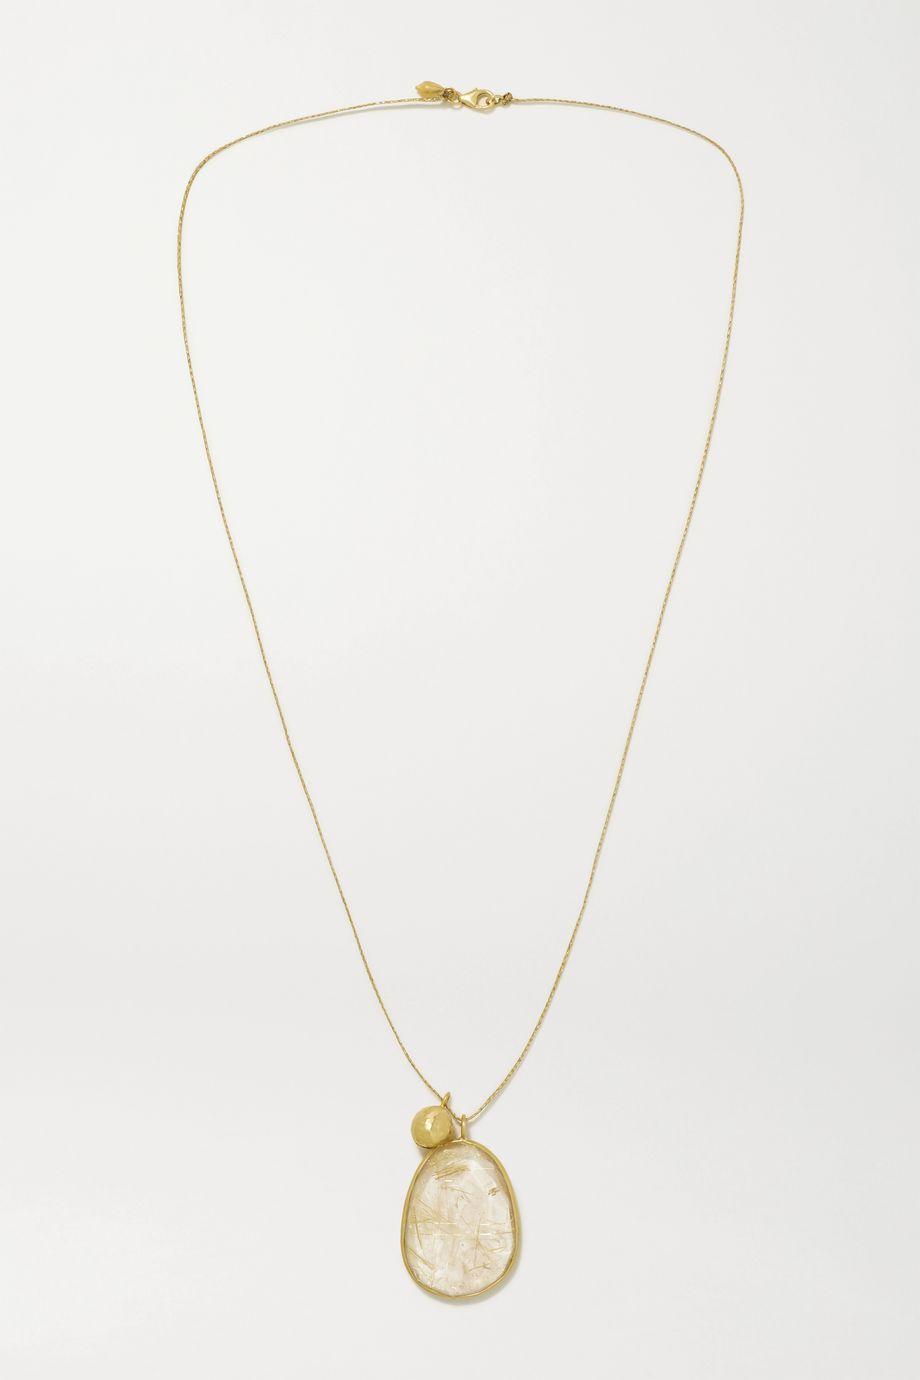 Pippa Small 18K 黄金石英项链